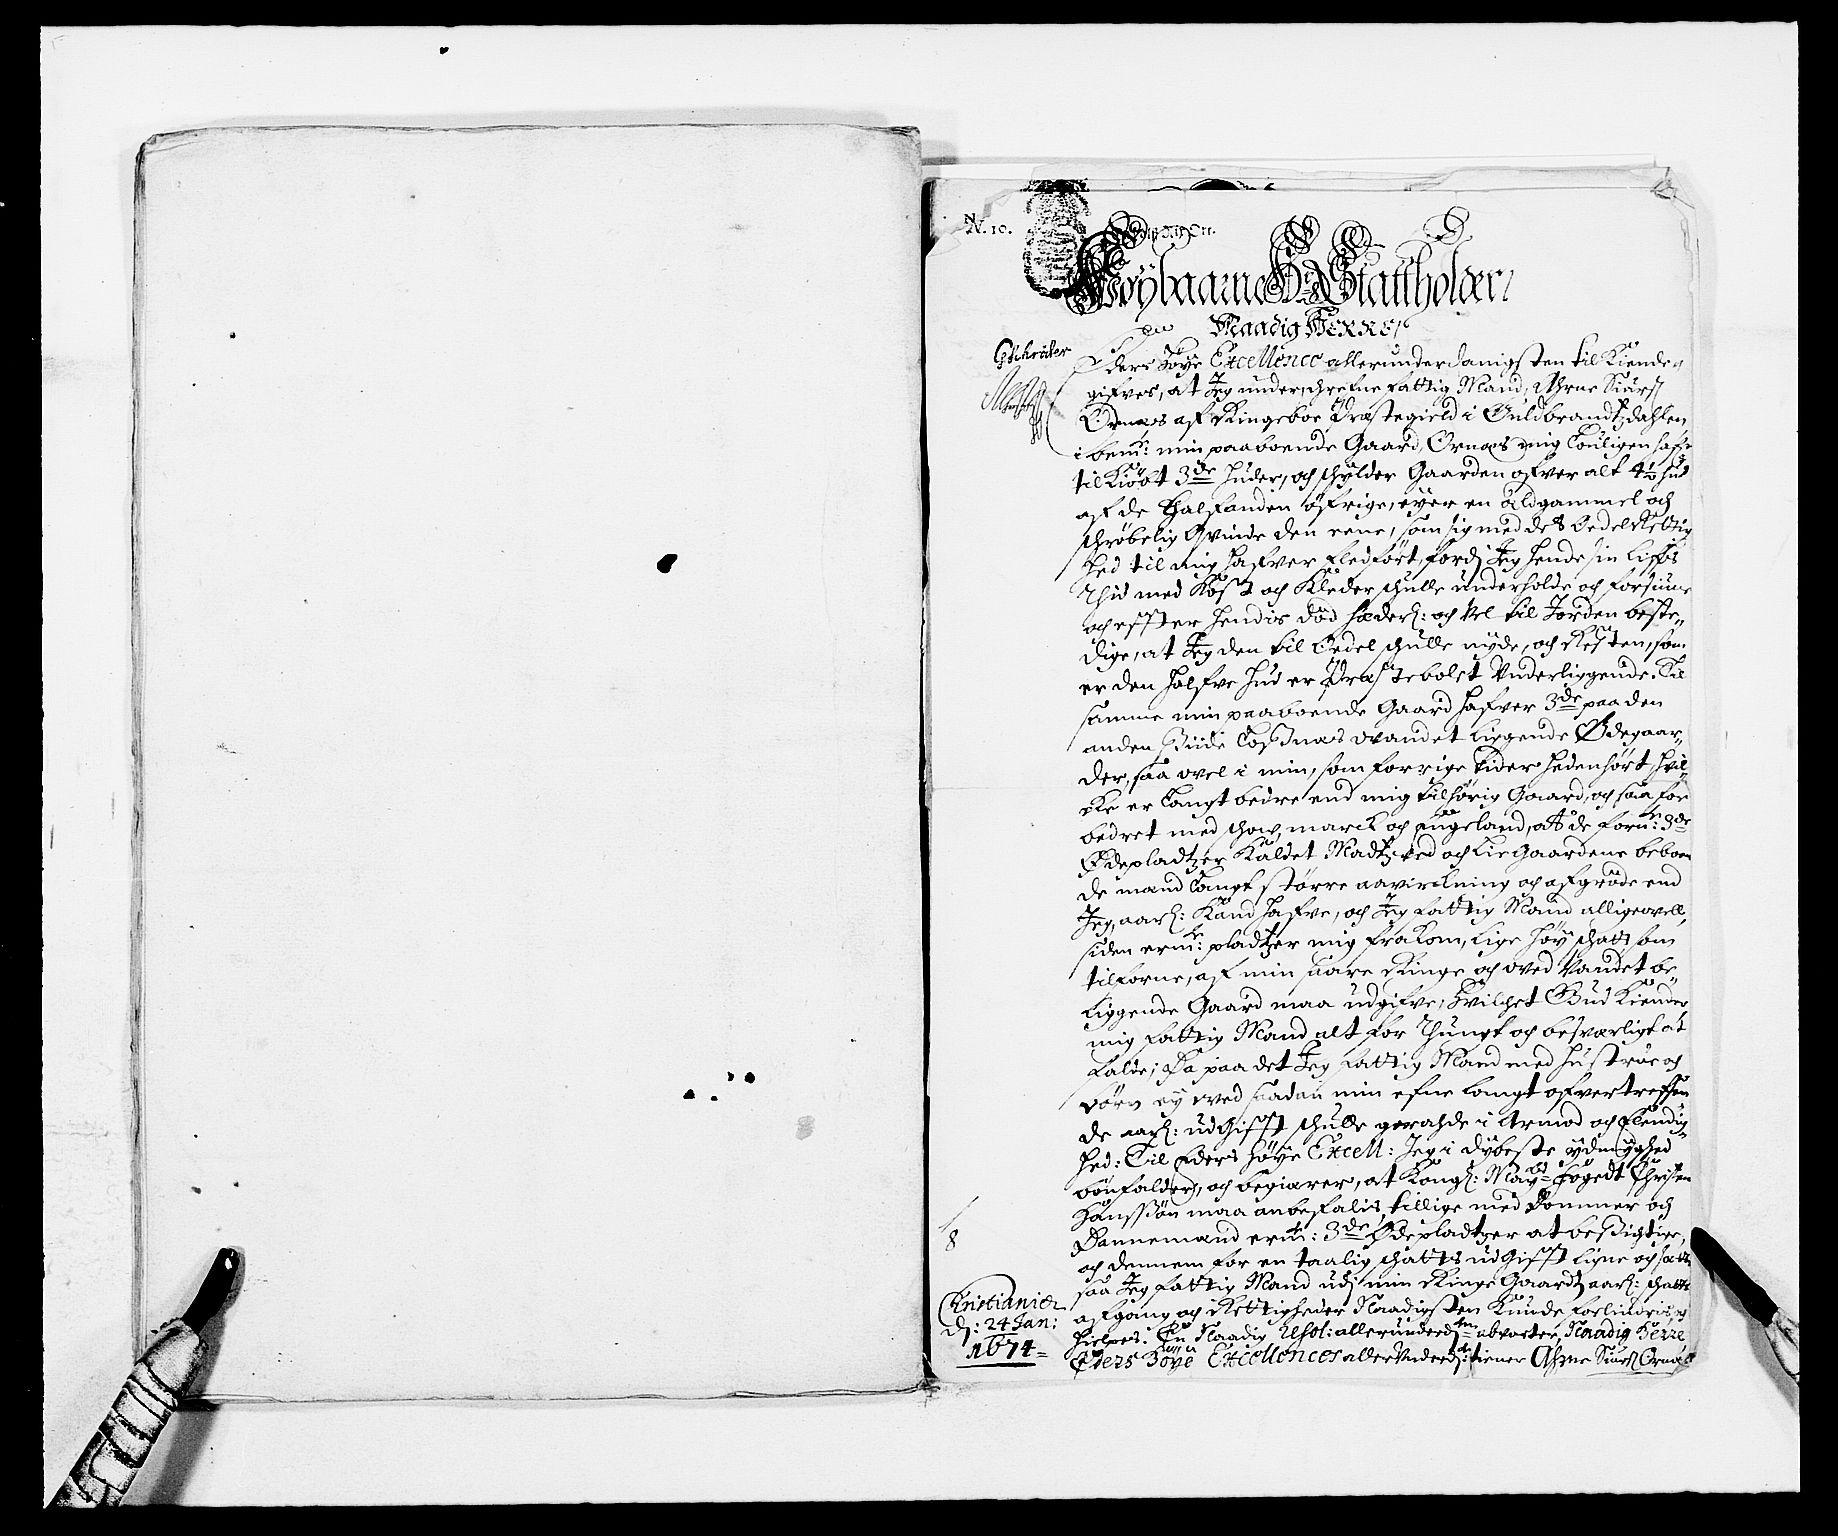 RA, Rentekammeret inntil 1814, Reviderte regnskaper, Fogderegnskap, R17/L1156: Fogderegnskap Gudbrandsdal, 1681, s. 174